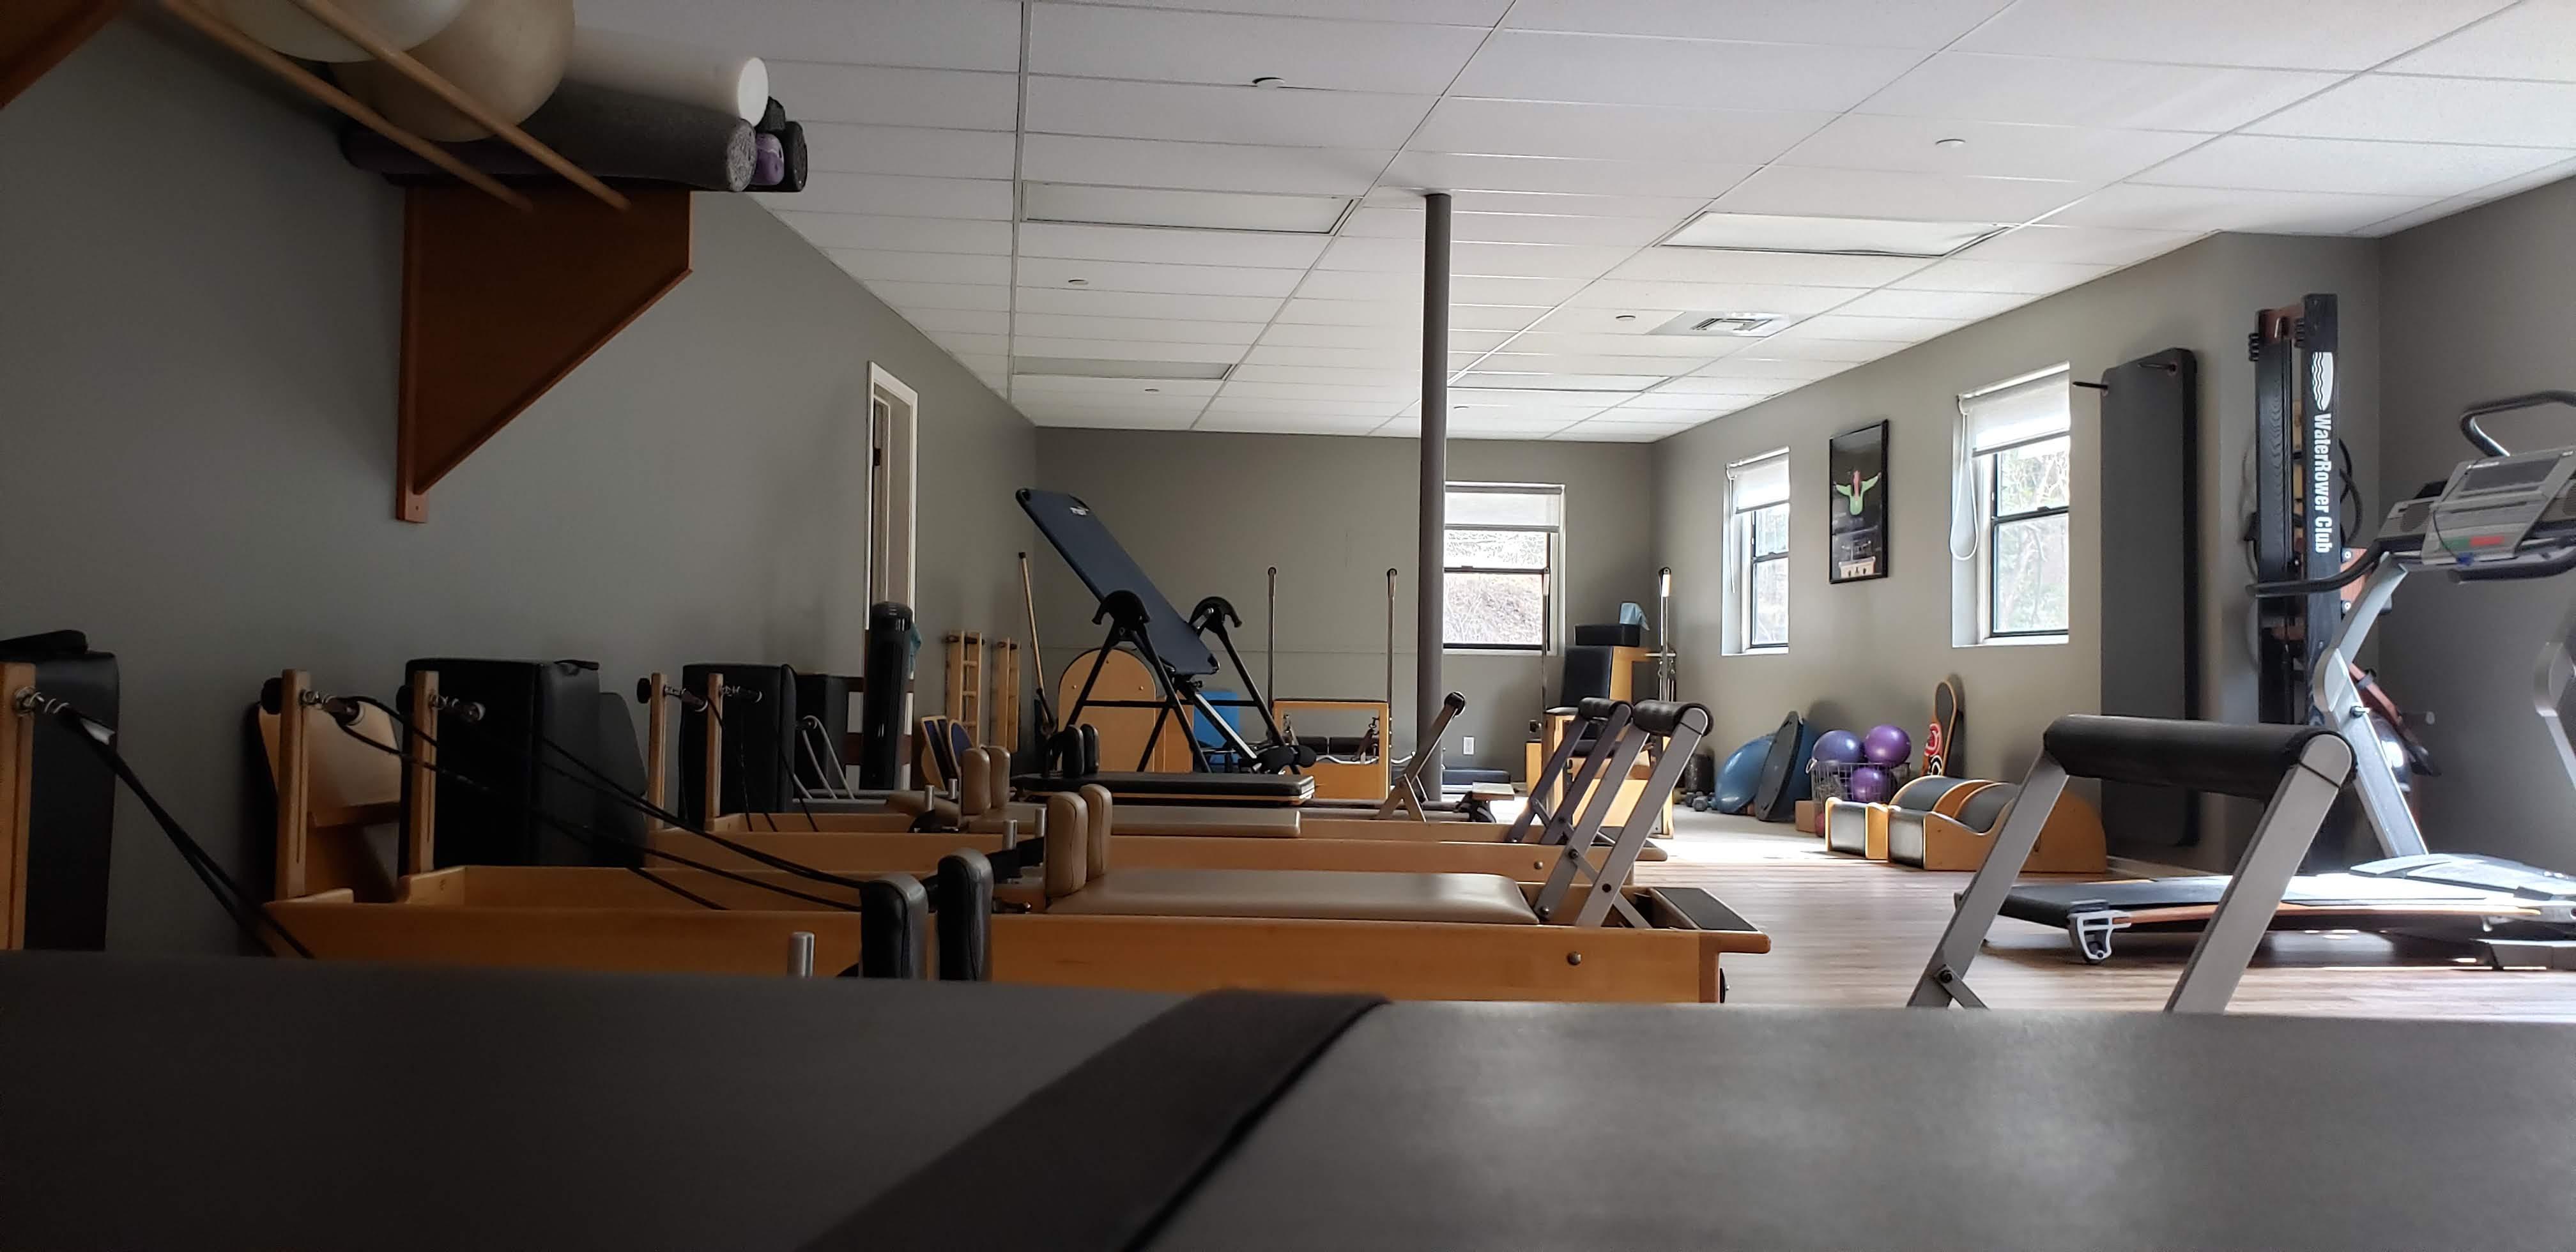 pilates-studio.jpg